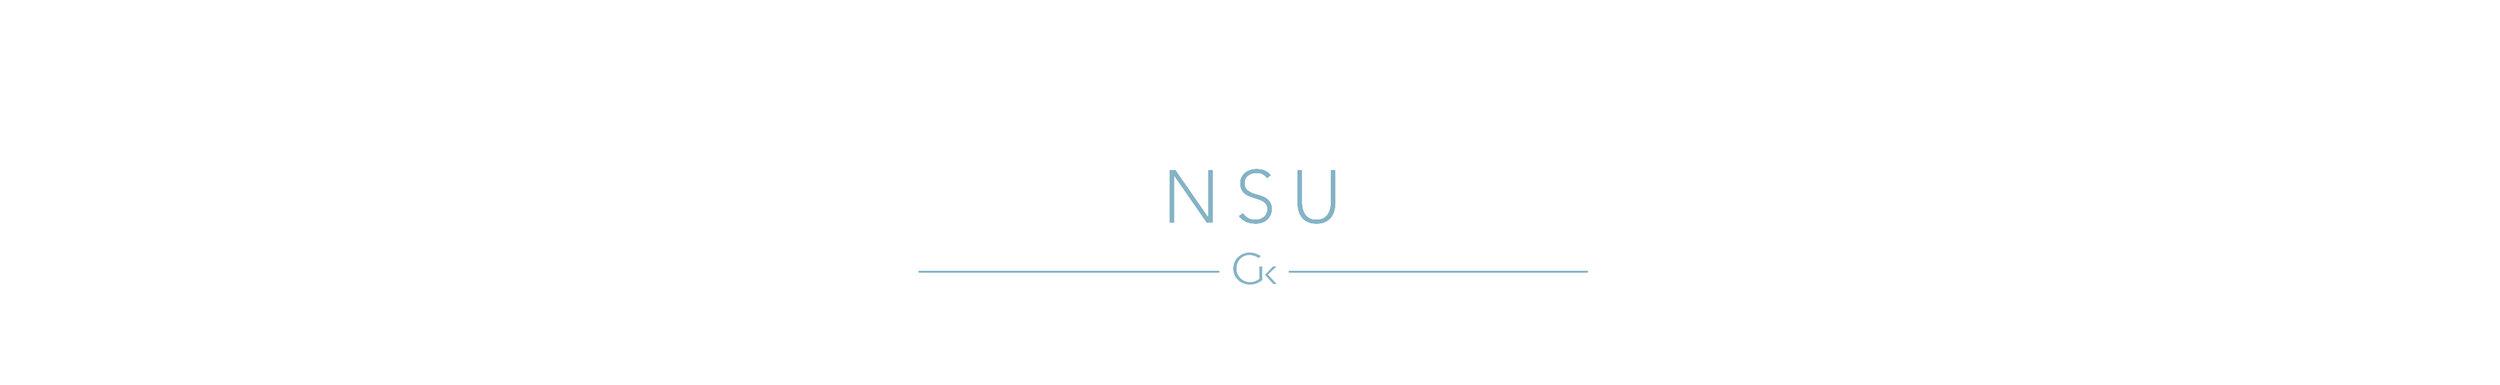 NSU.jpg